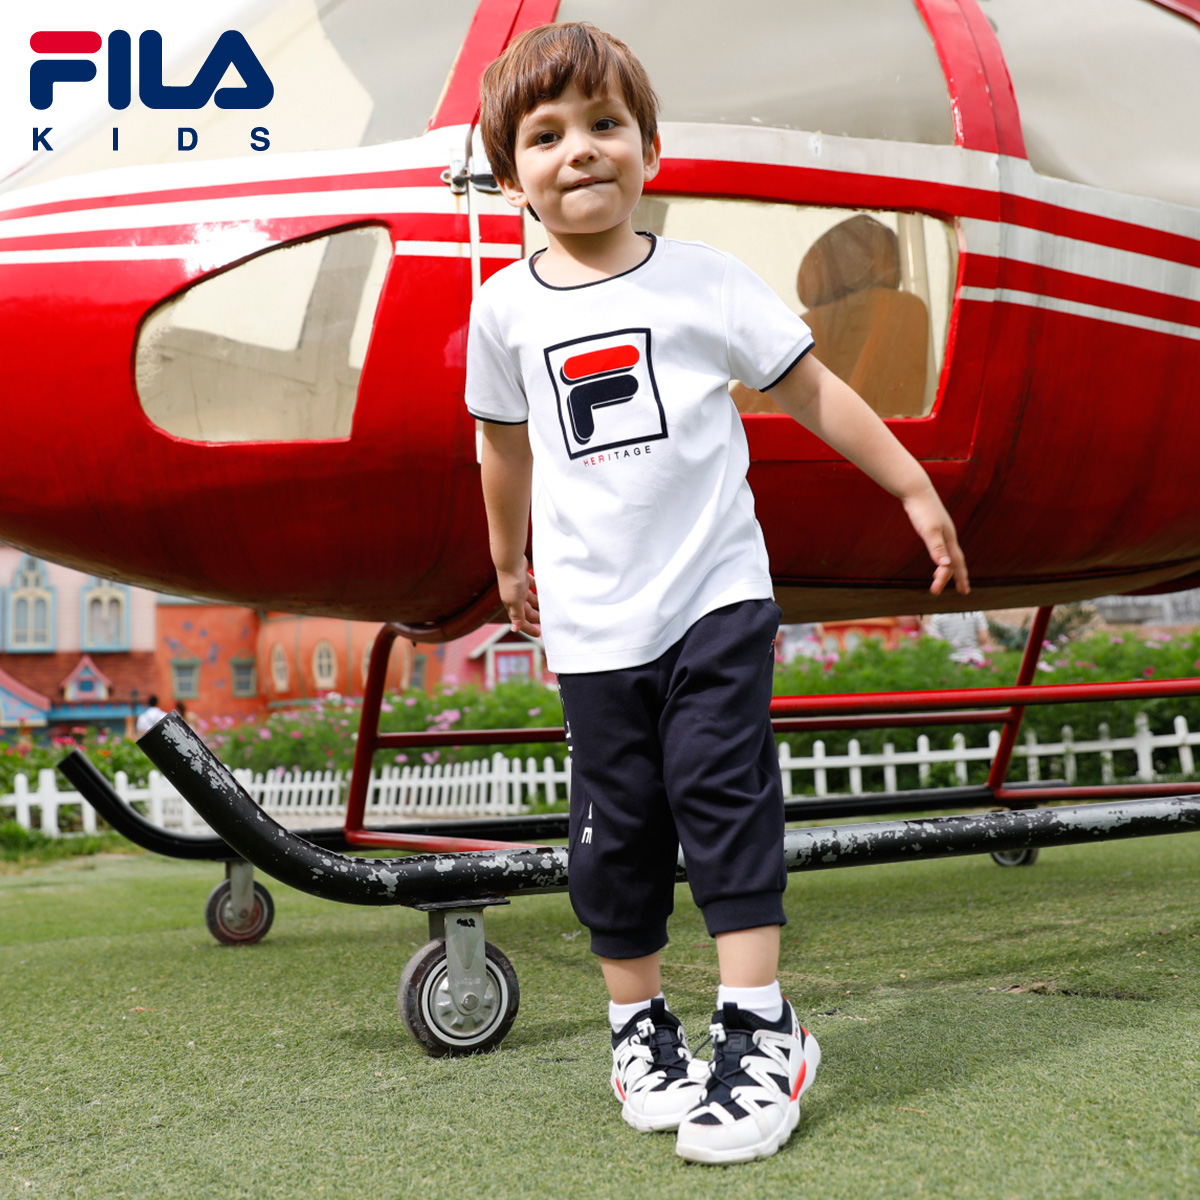 FILA斐乐童装夏季新款男小童短袖套装舒适LOGO短T恤五分裤子2018